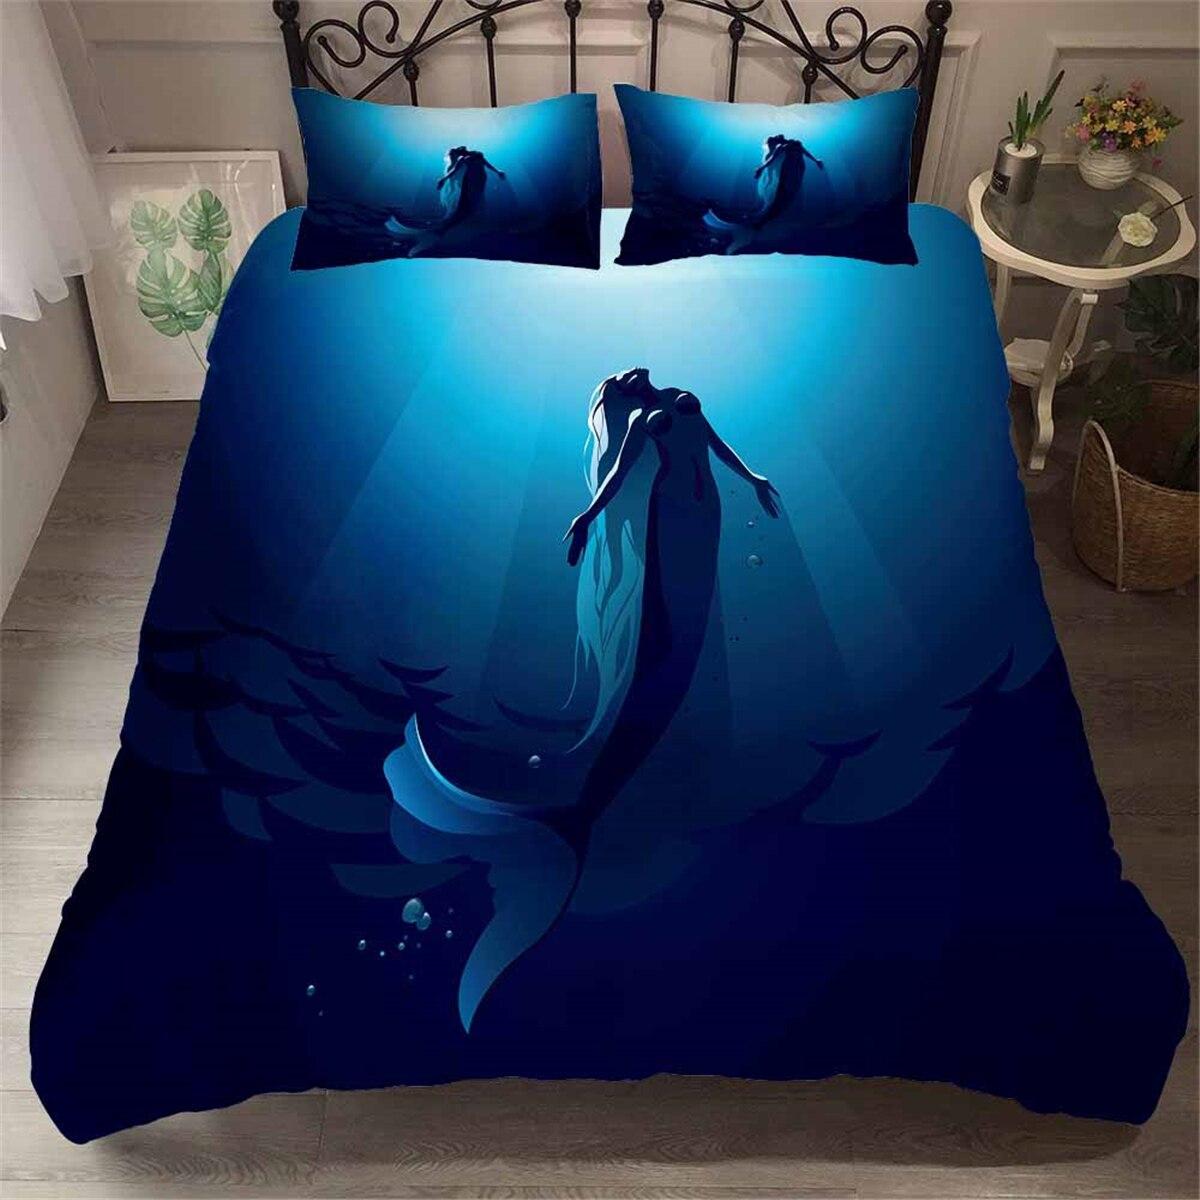 home textile deep sea mermaid bedding set girls comforter sets single double size bed duvet cover blue art bedspread pillow set